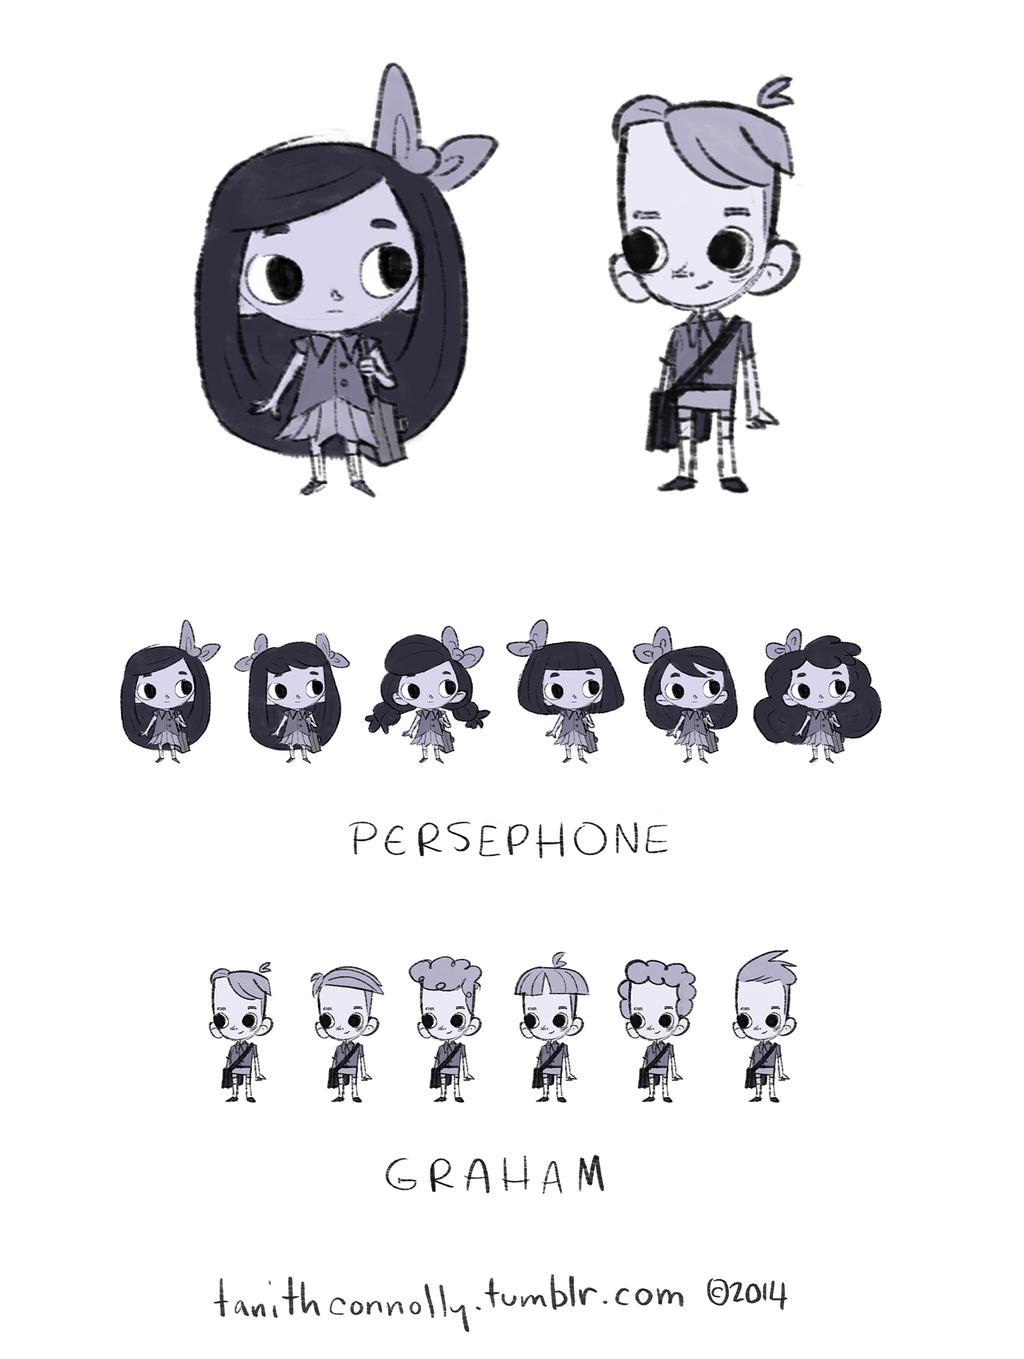 Persephone and Graham